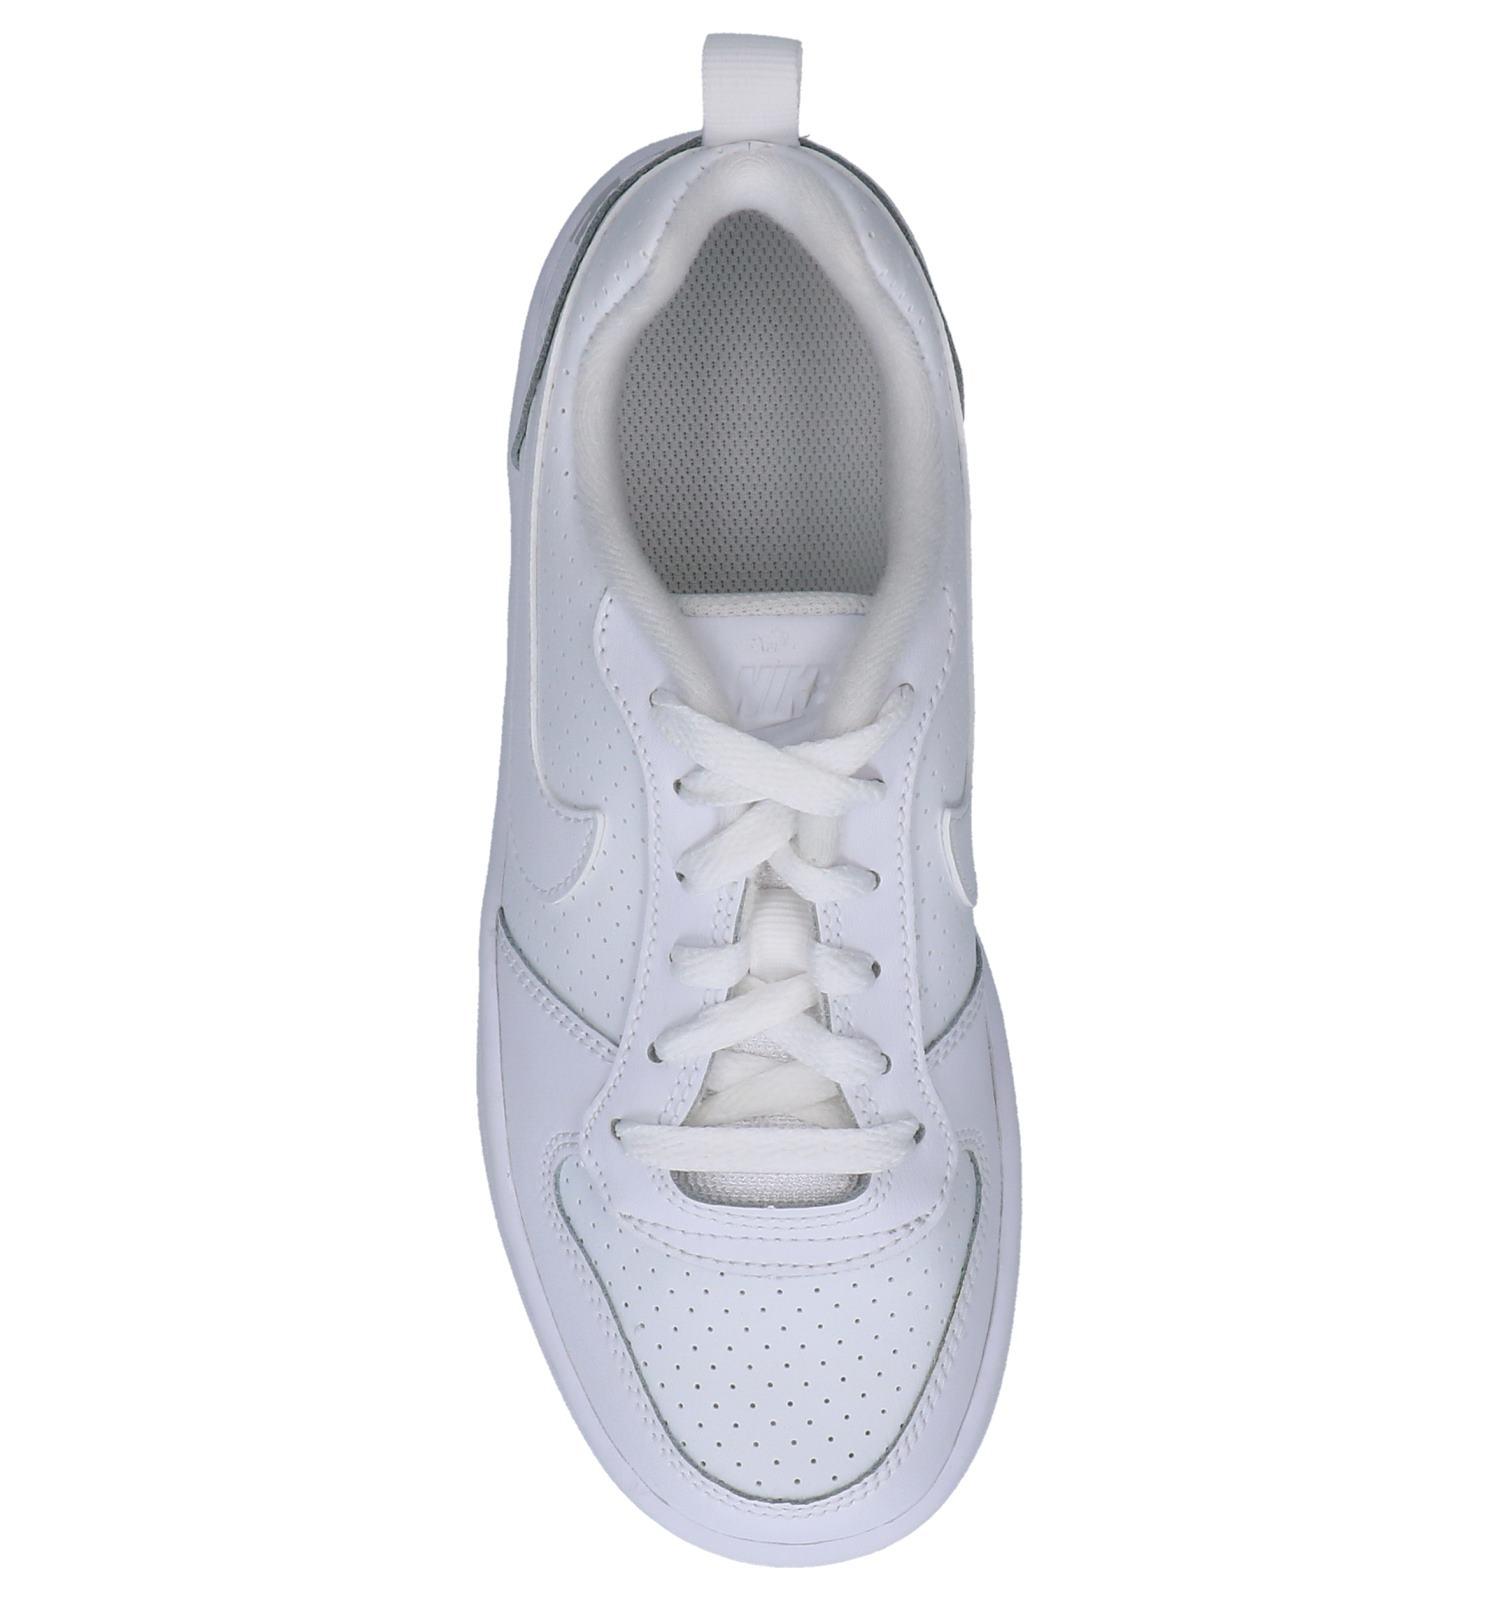 a8623ae8597 Witte Sneakers Nike Court Borough Low | TORFS.BE | Gratis verzend en retour